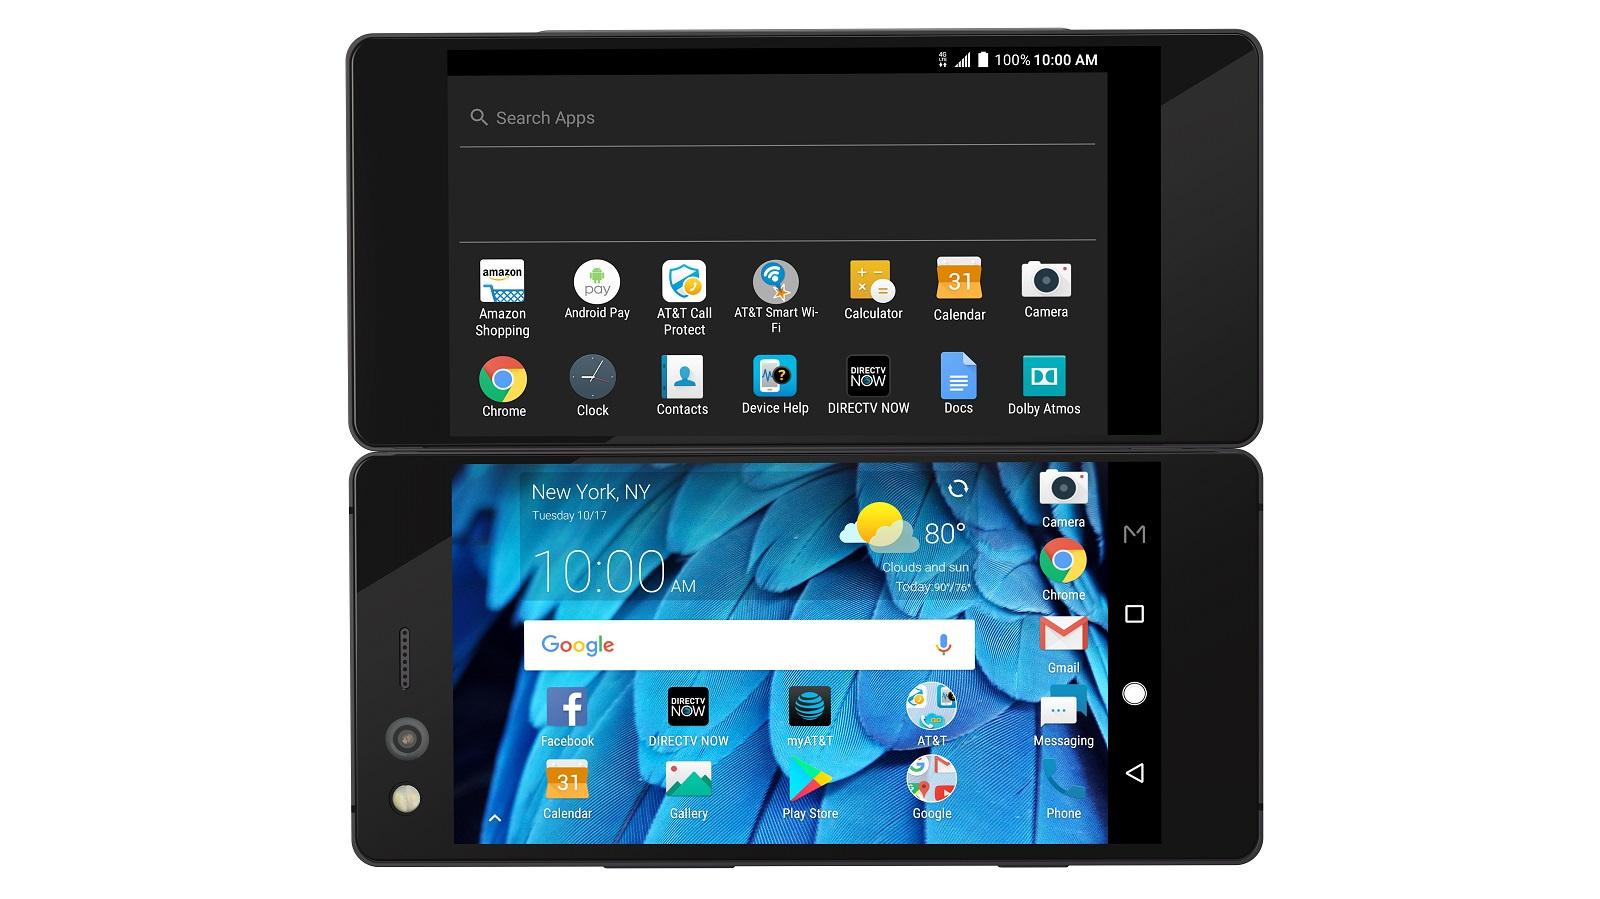 zte axon m open - ZTE تطلق هاتف Axon M بقوة هاتفين مدمجين في هاتف واحد قابل للطي